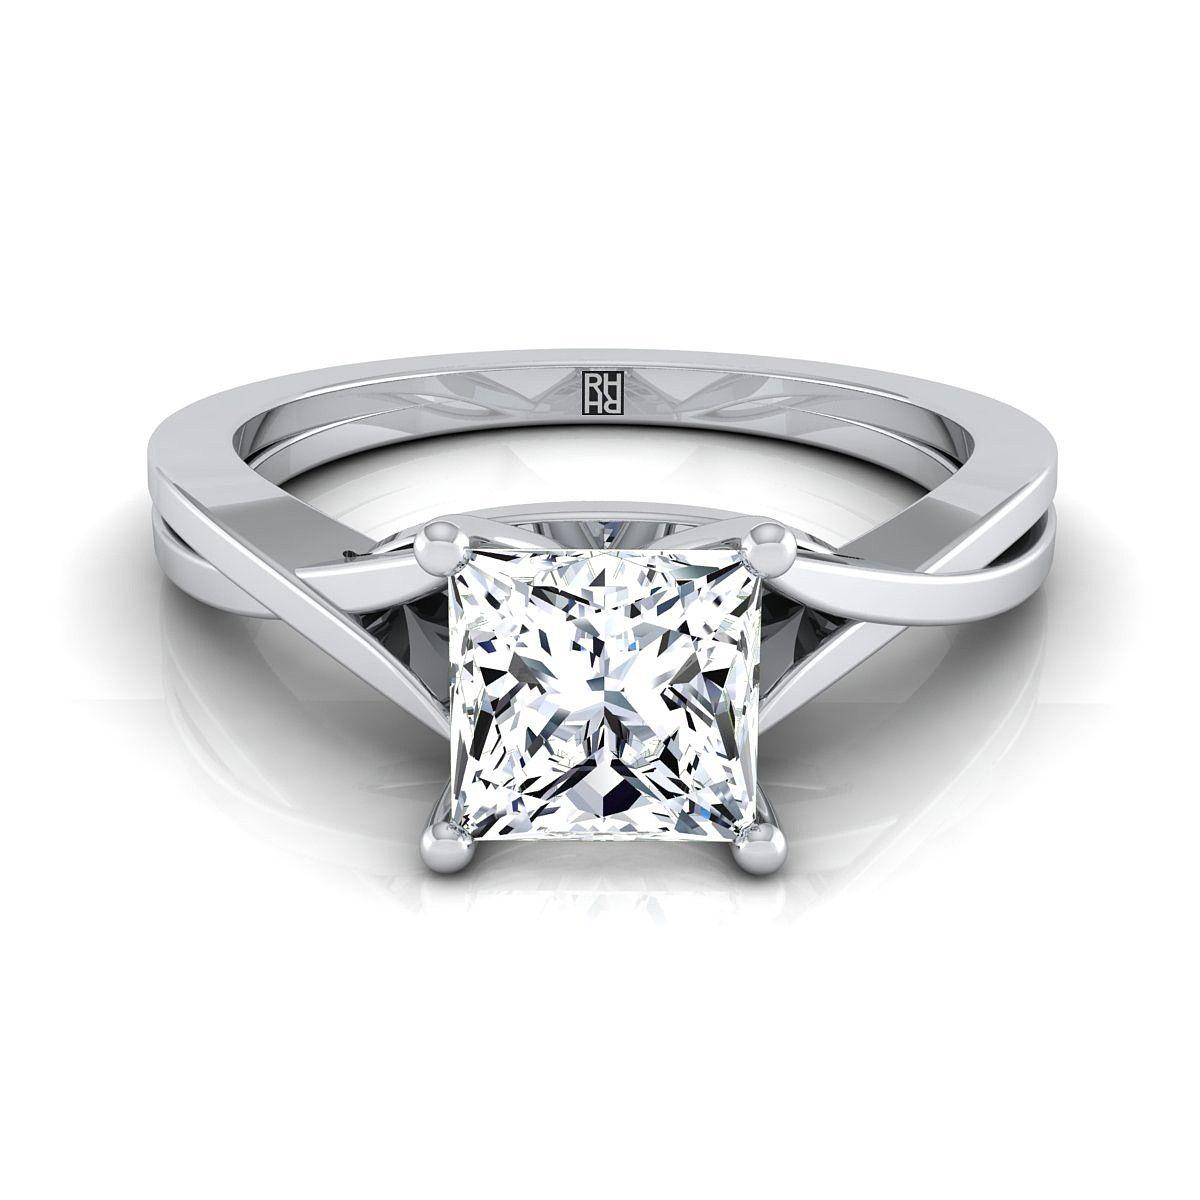 44+ Princess cut wedding band platinum information